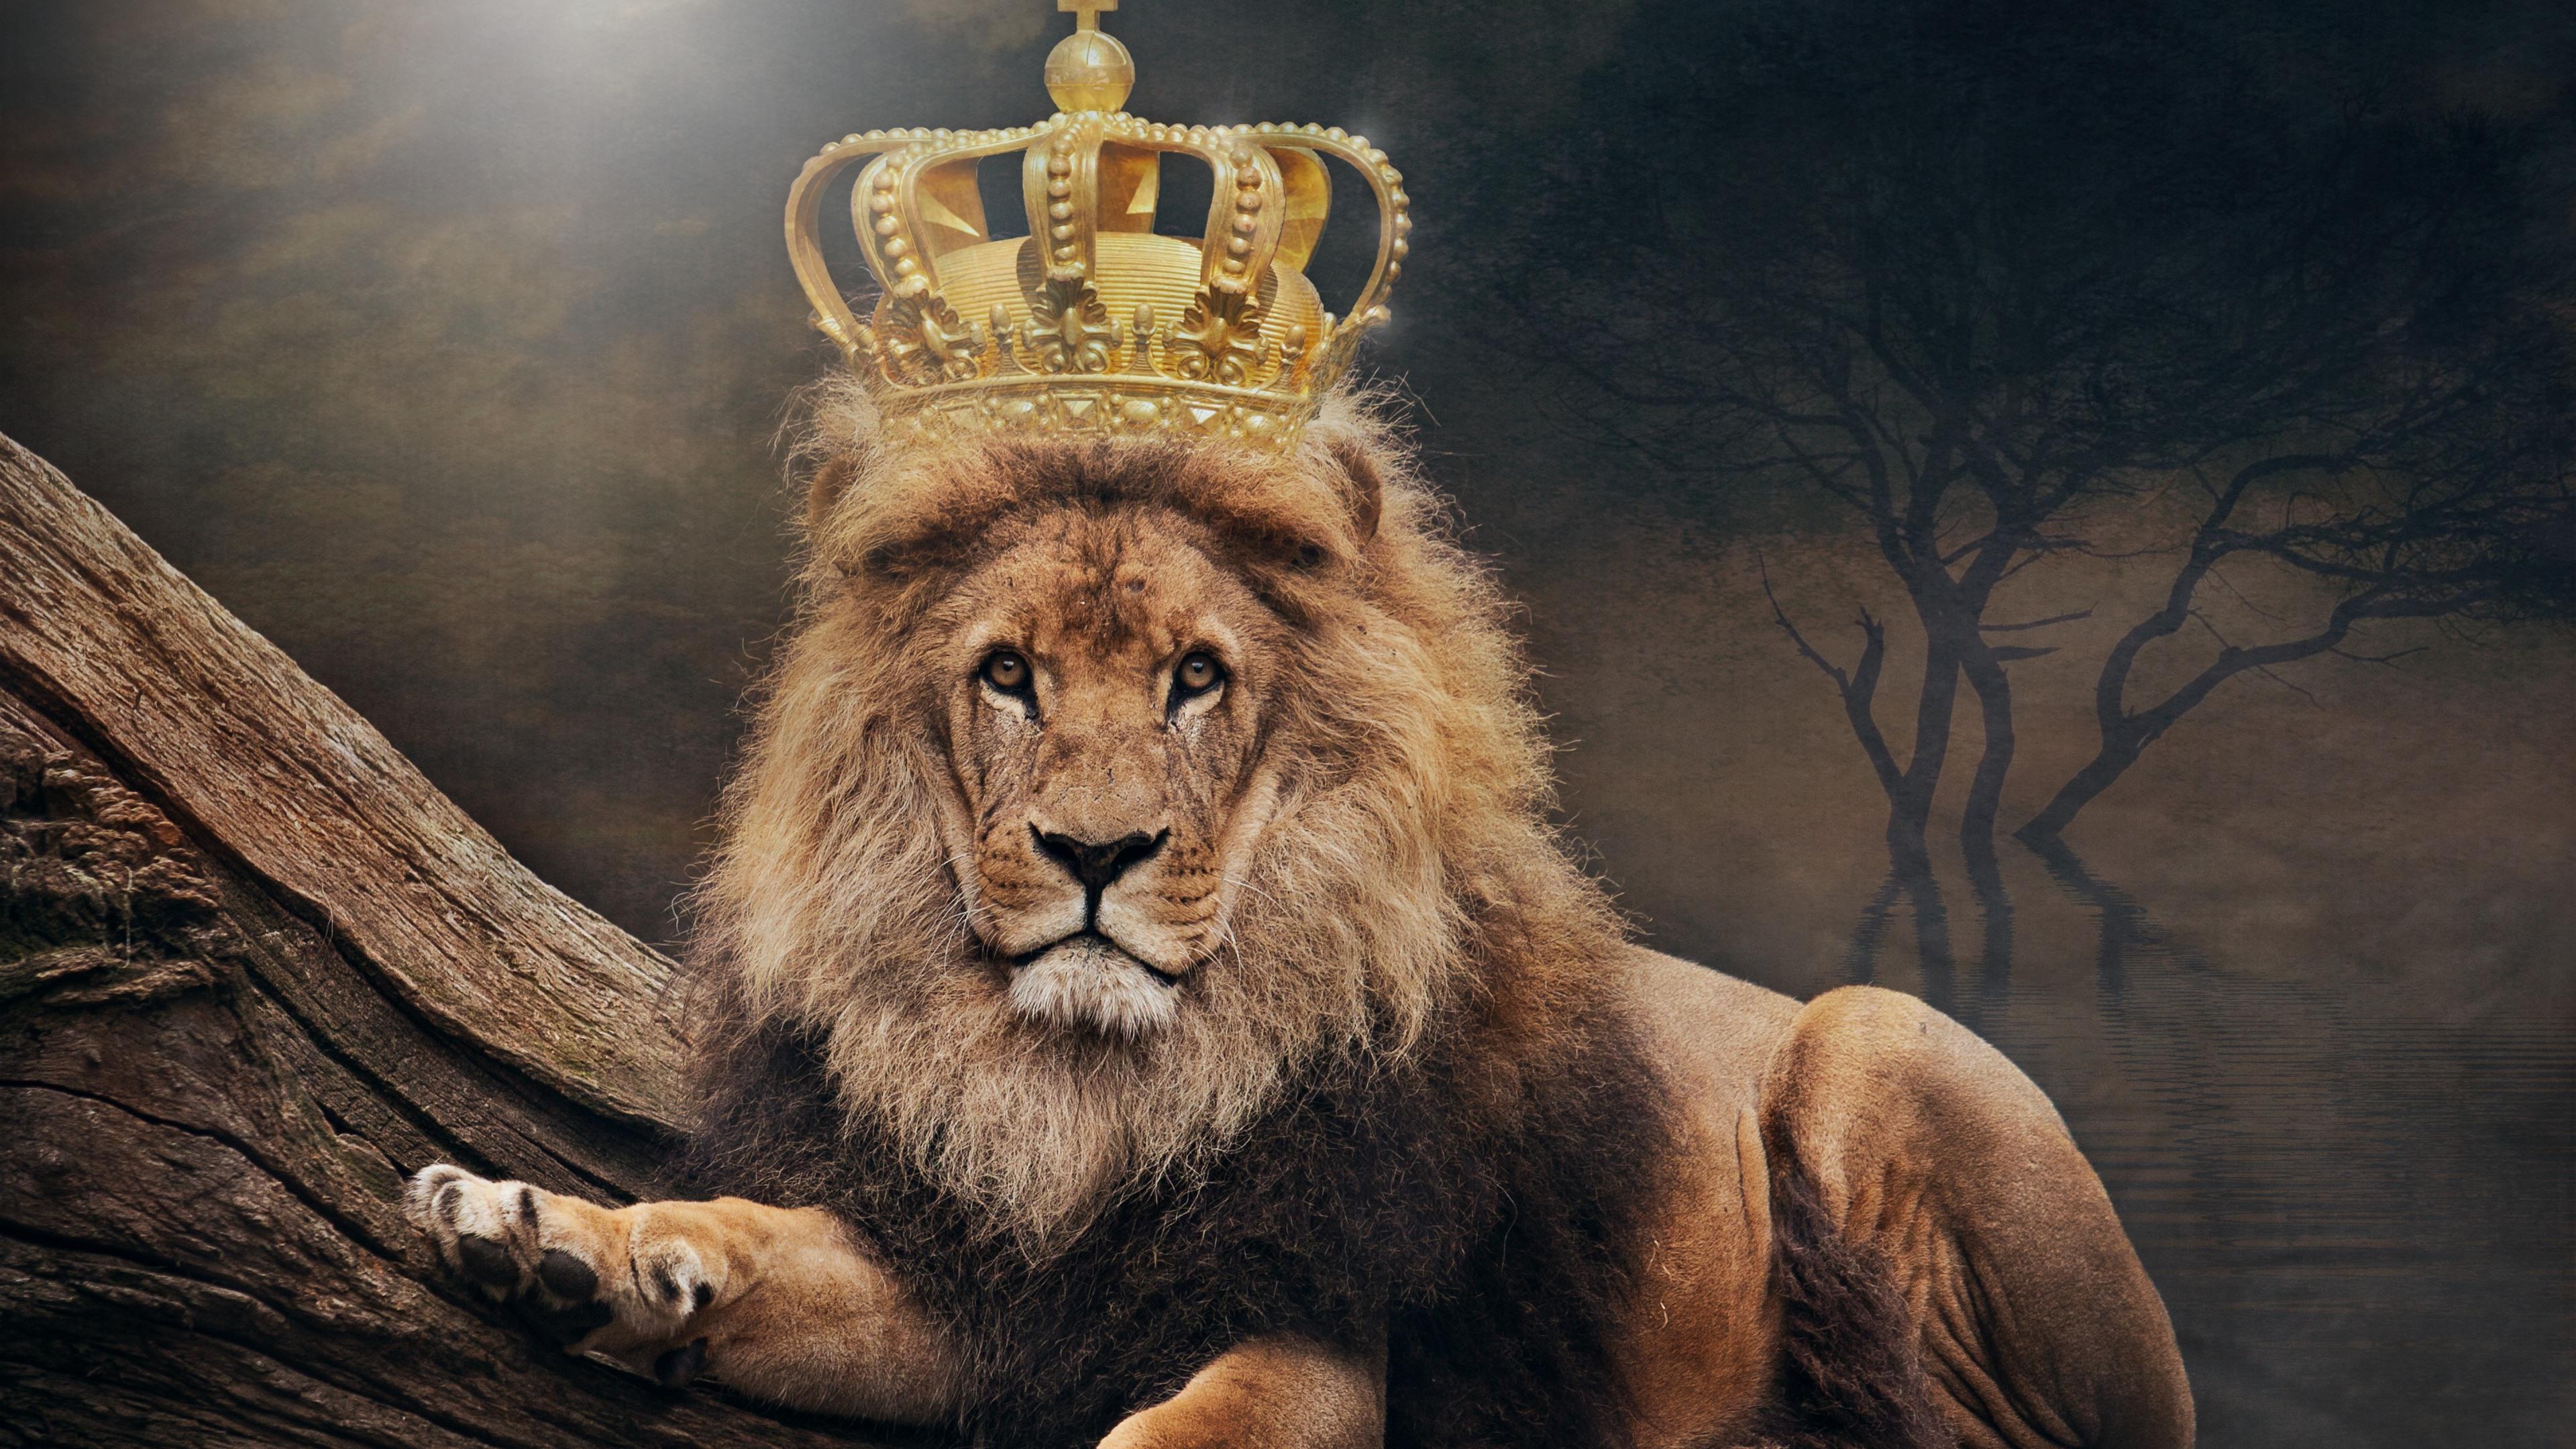 Wallpaper Lion, king, crown 3840x2160 UHD 4K Picture, Image